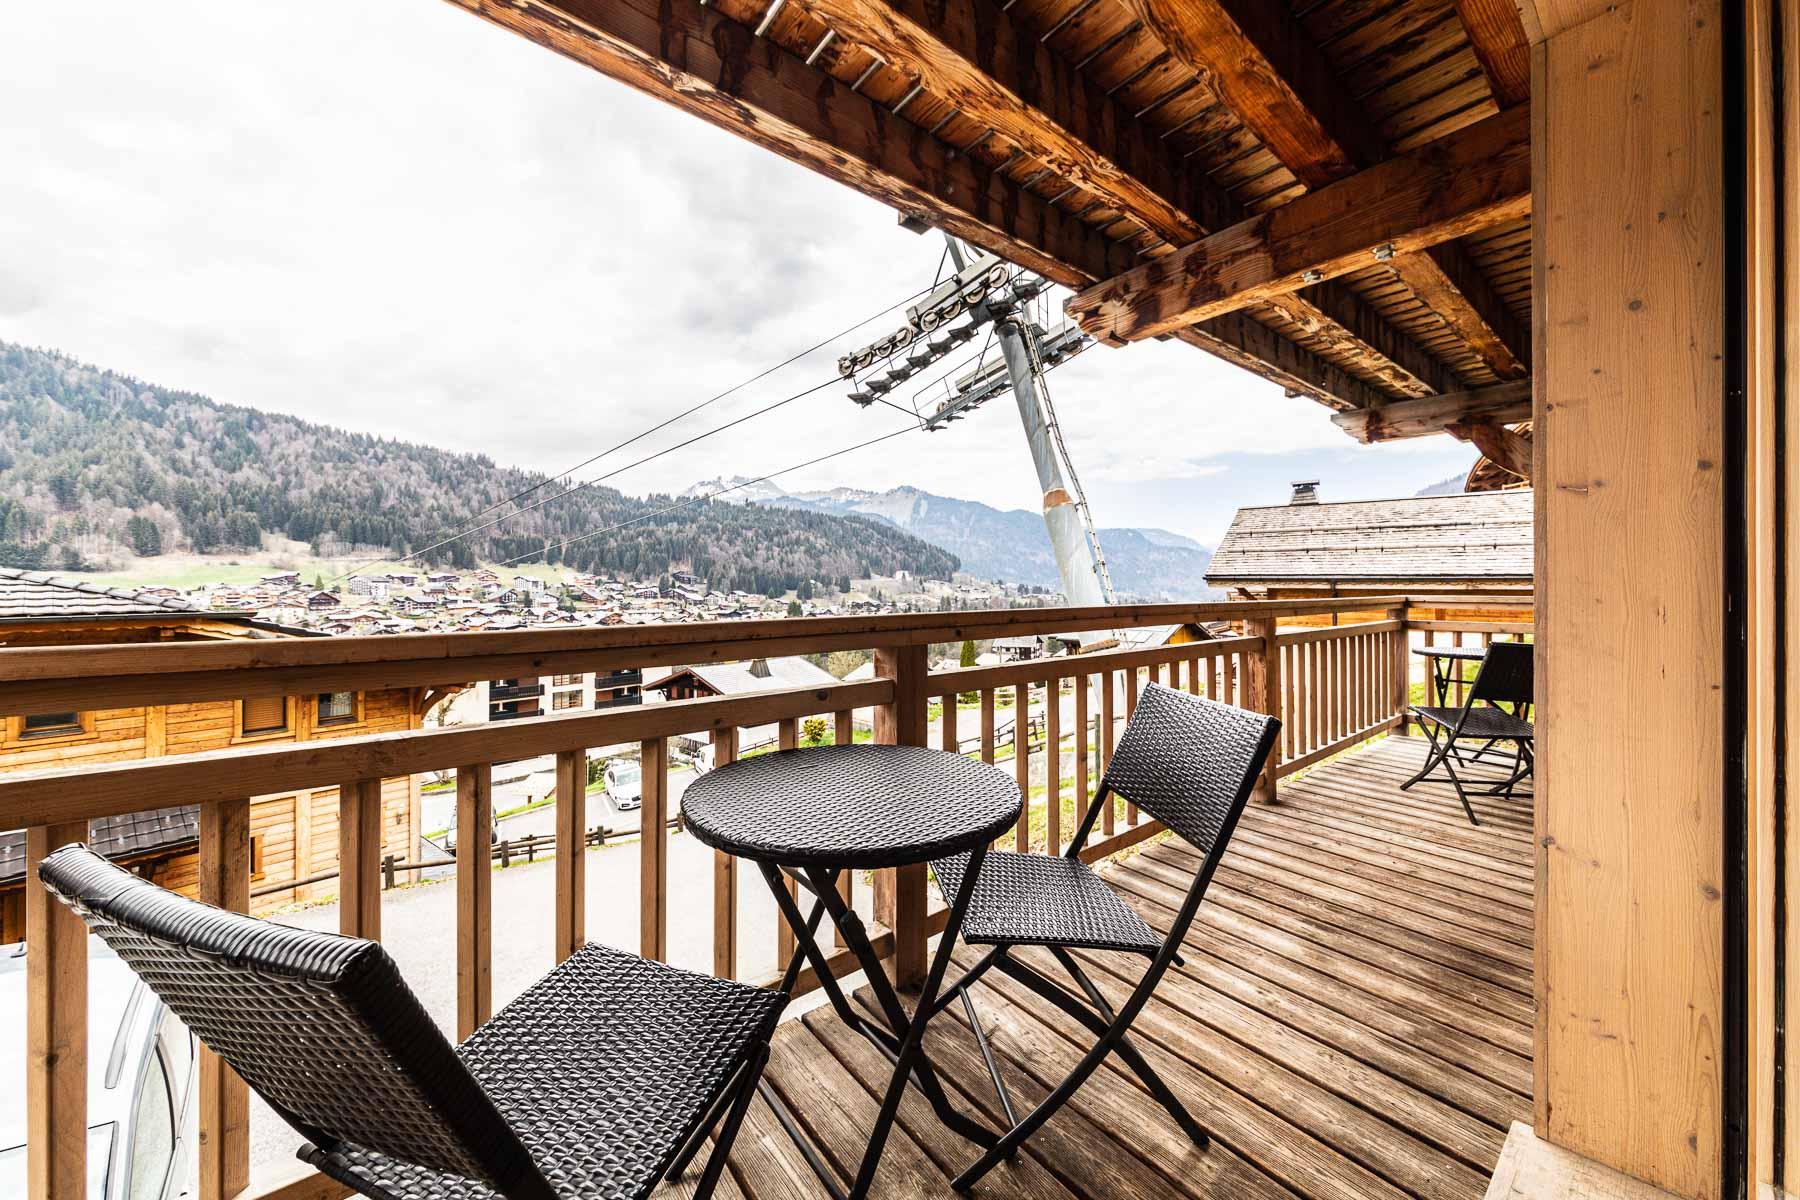 Bois Venants Appt 295 Balcony